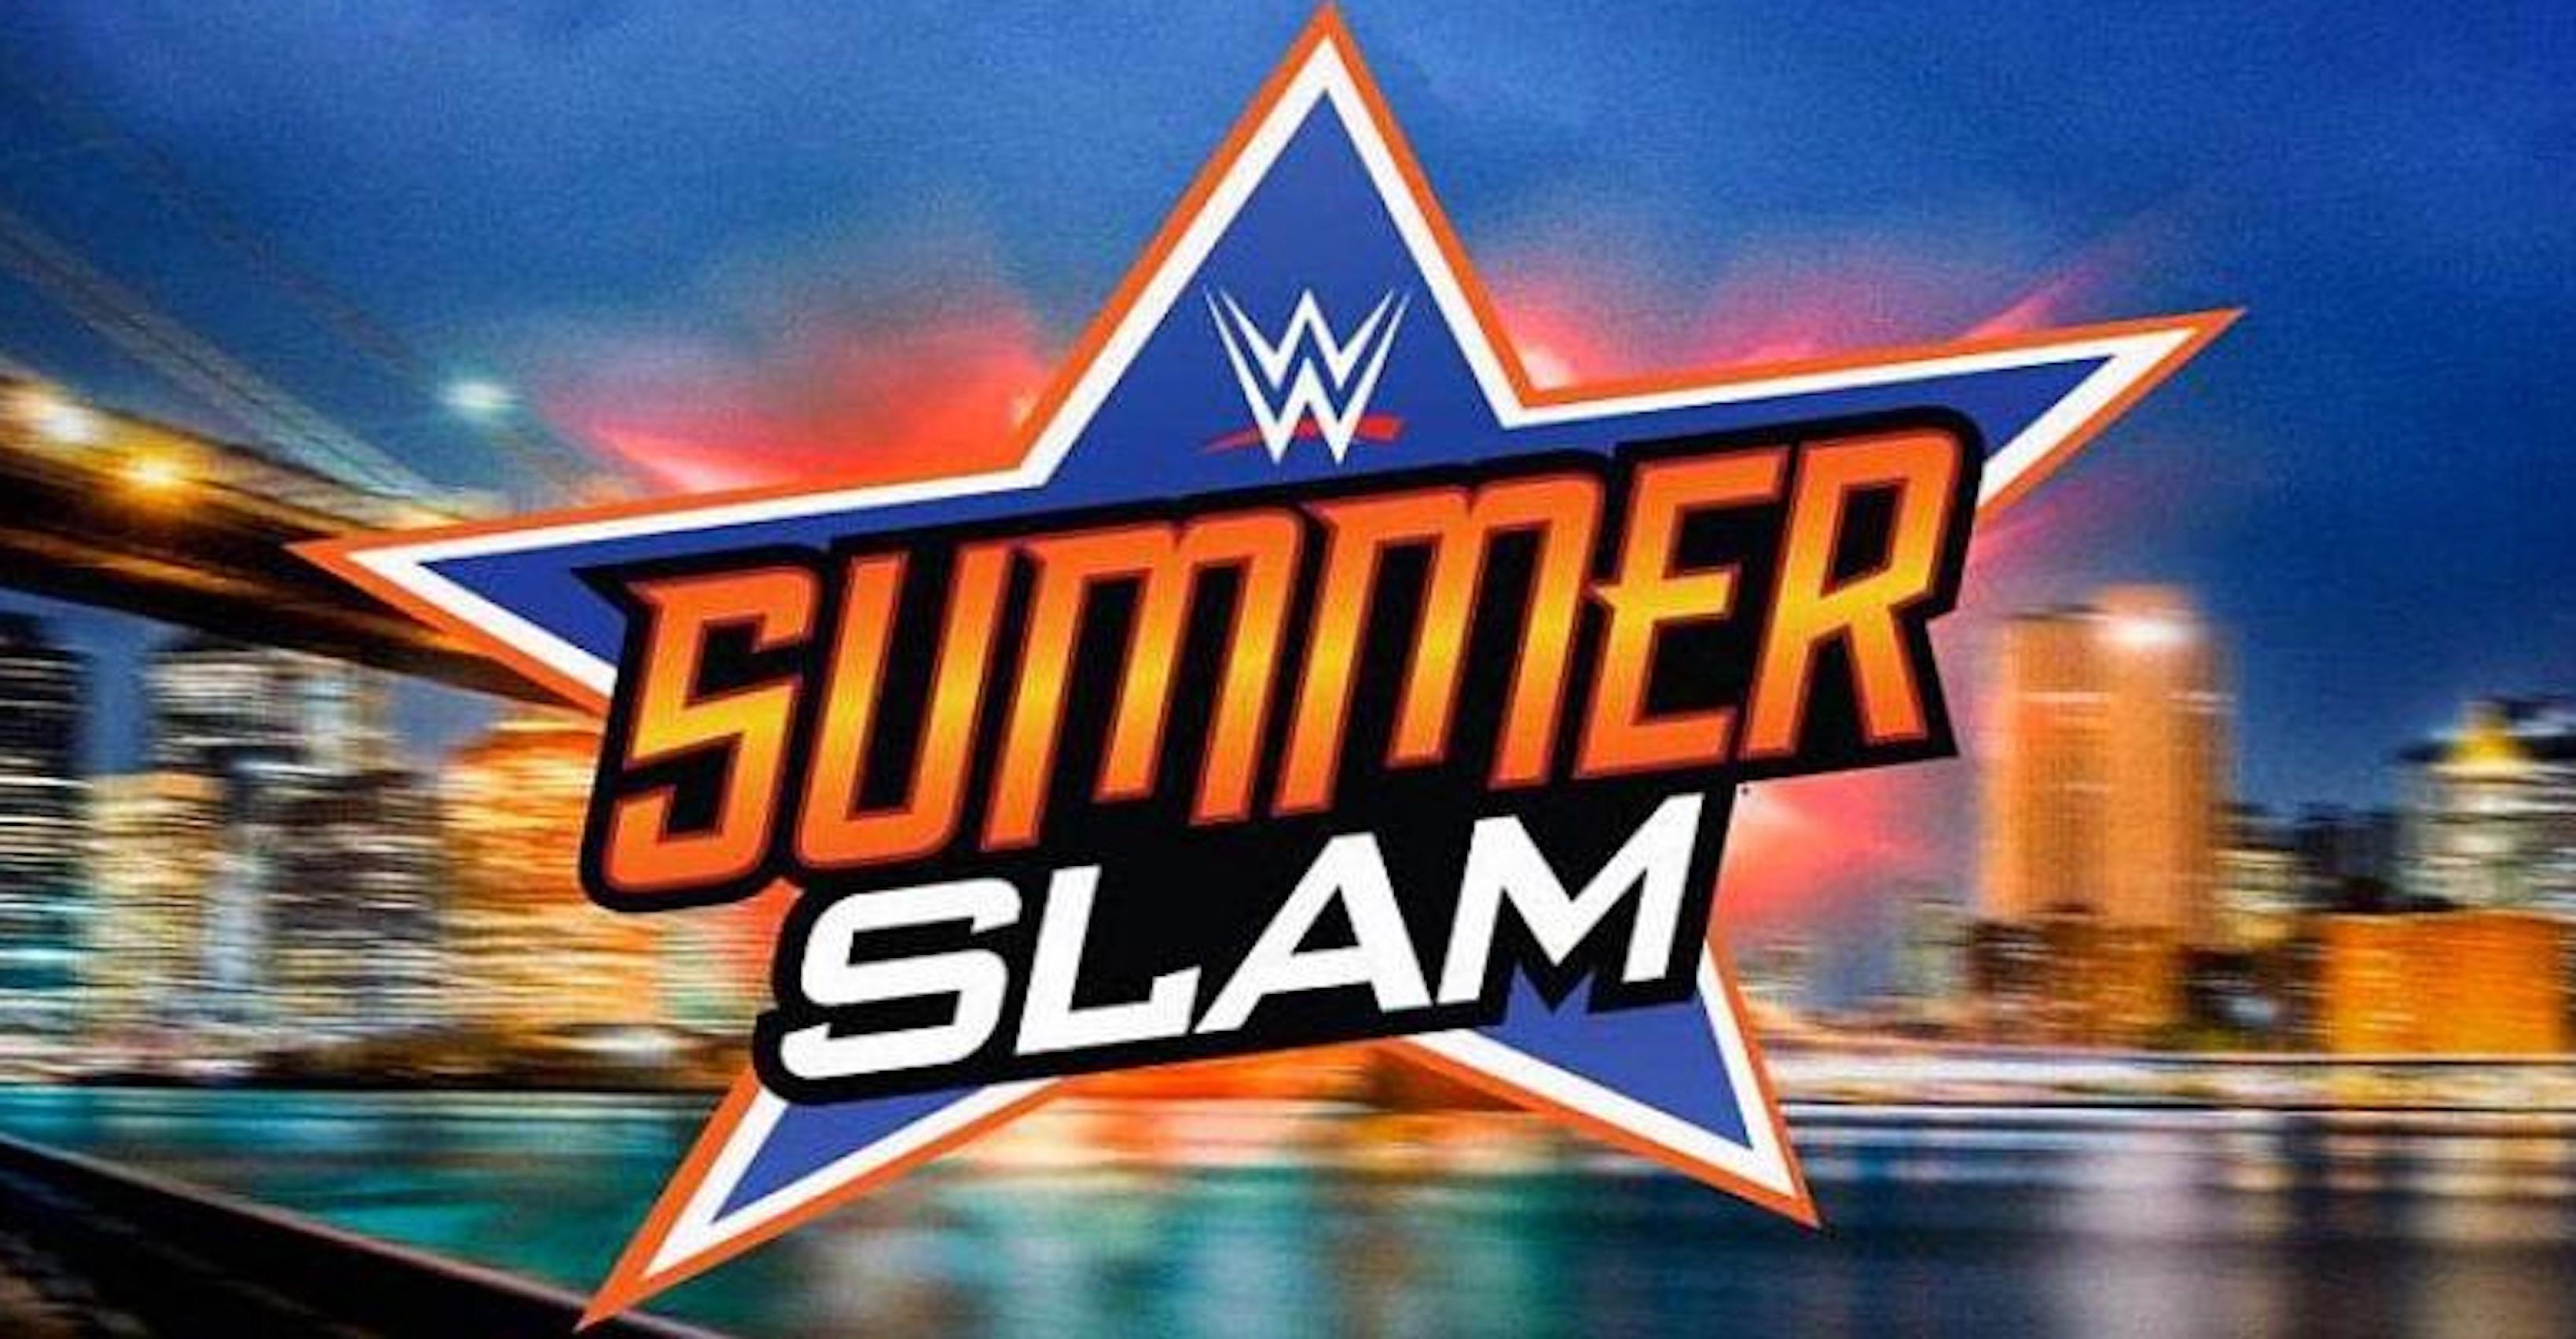 WWE 'SummerSlam' (8/11): Full Match Results